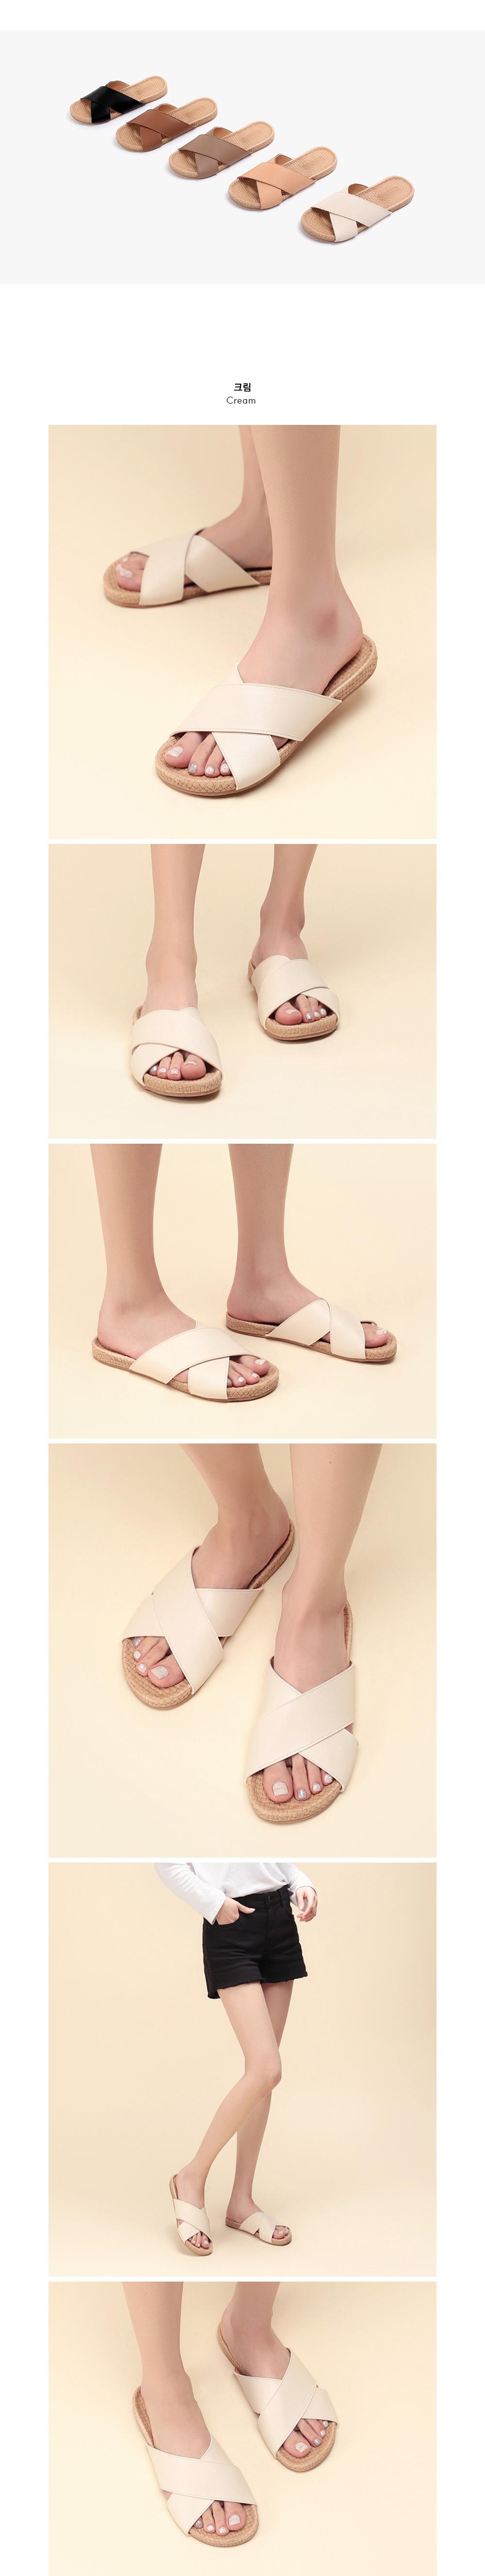 X-kinked sandals